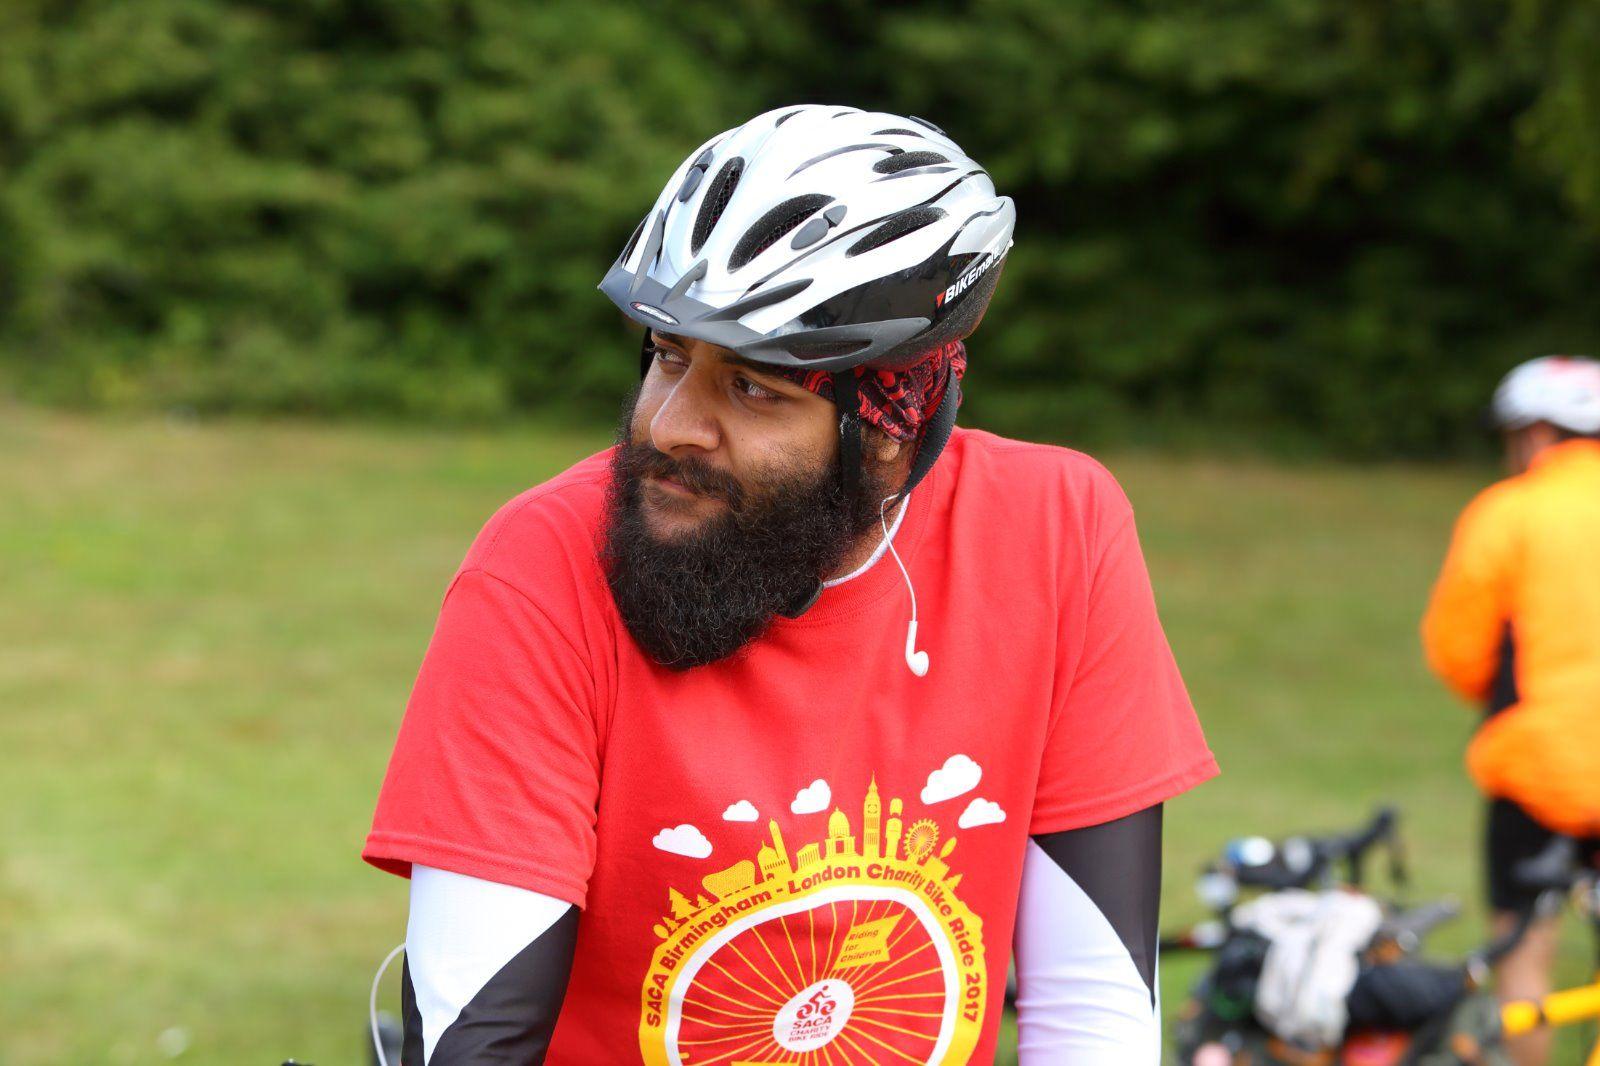 Bike Ride 2017